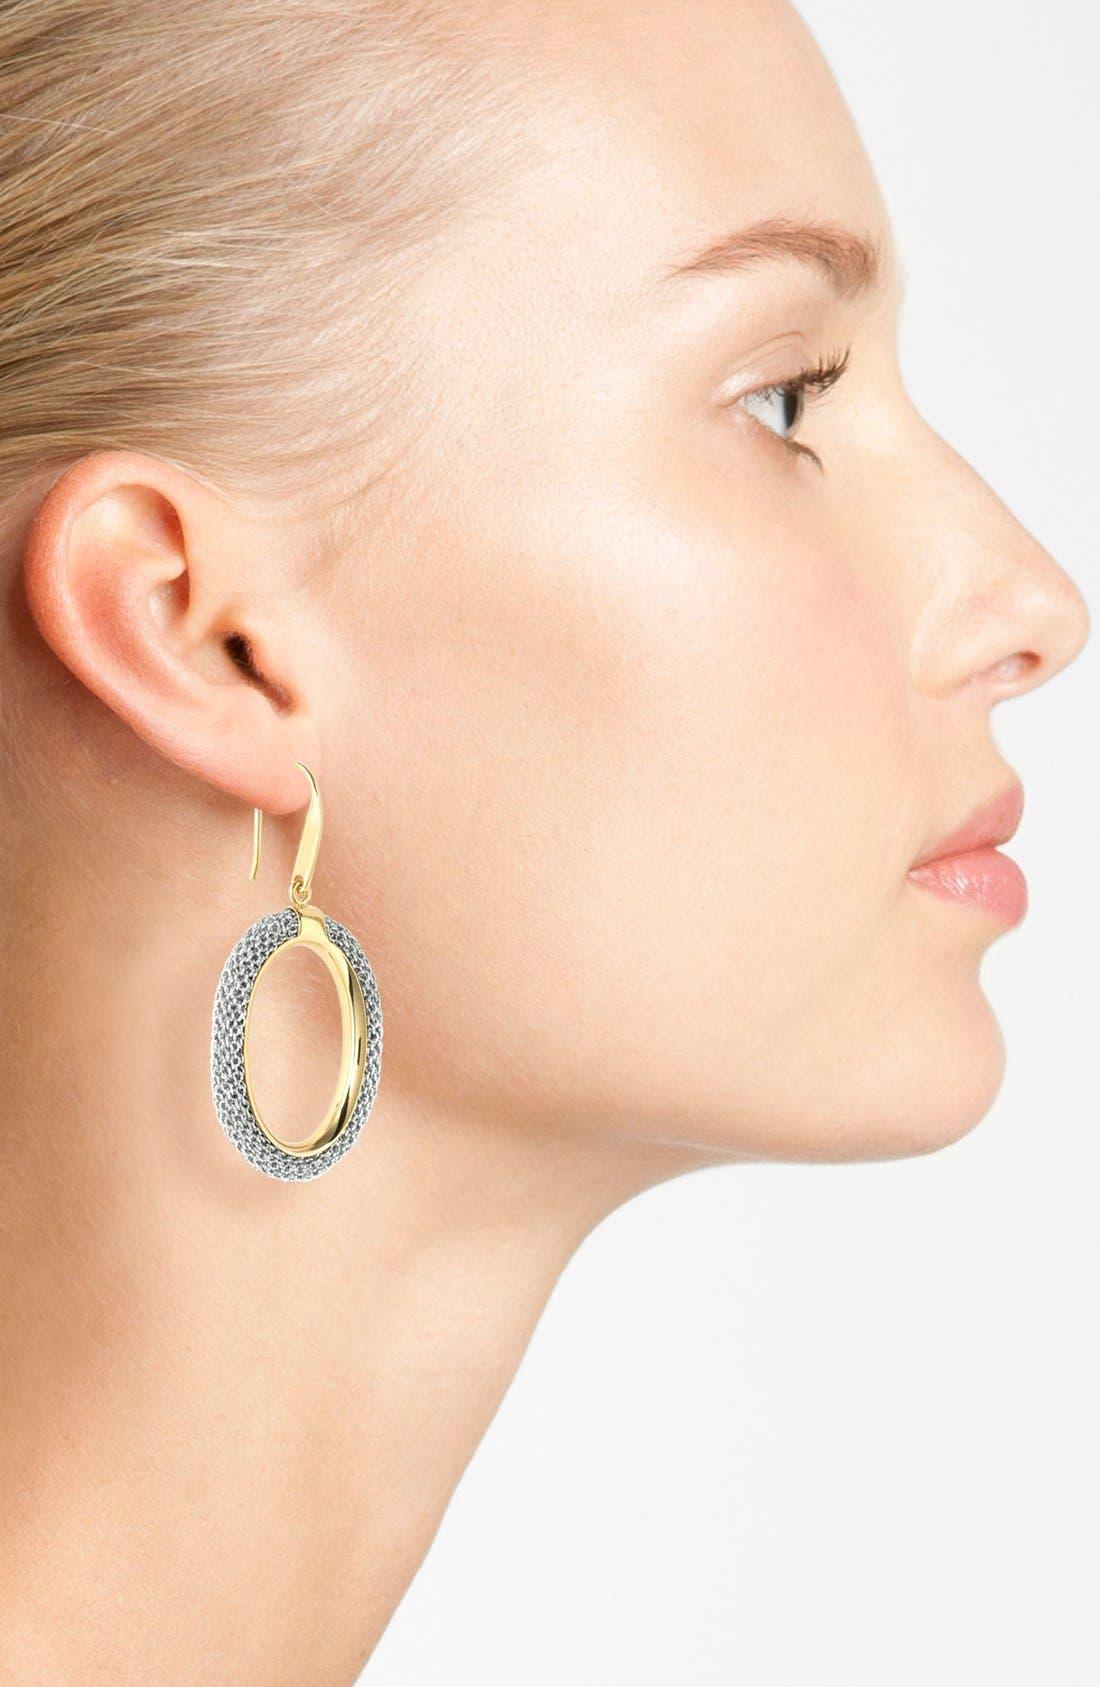 Alternate Image 2  - Adami & Martucci 'Mesh' Oval Drop Earrings (Nordstrom Exclusive)